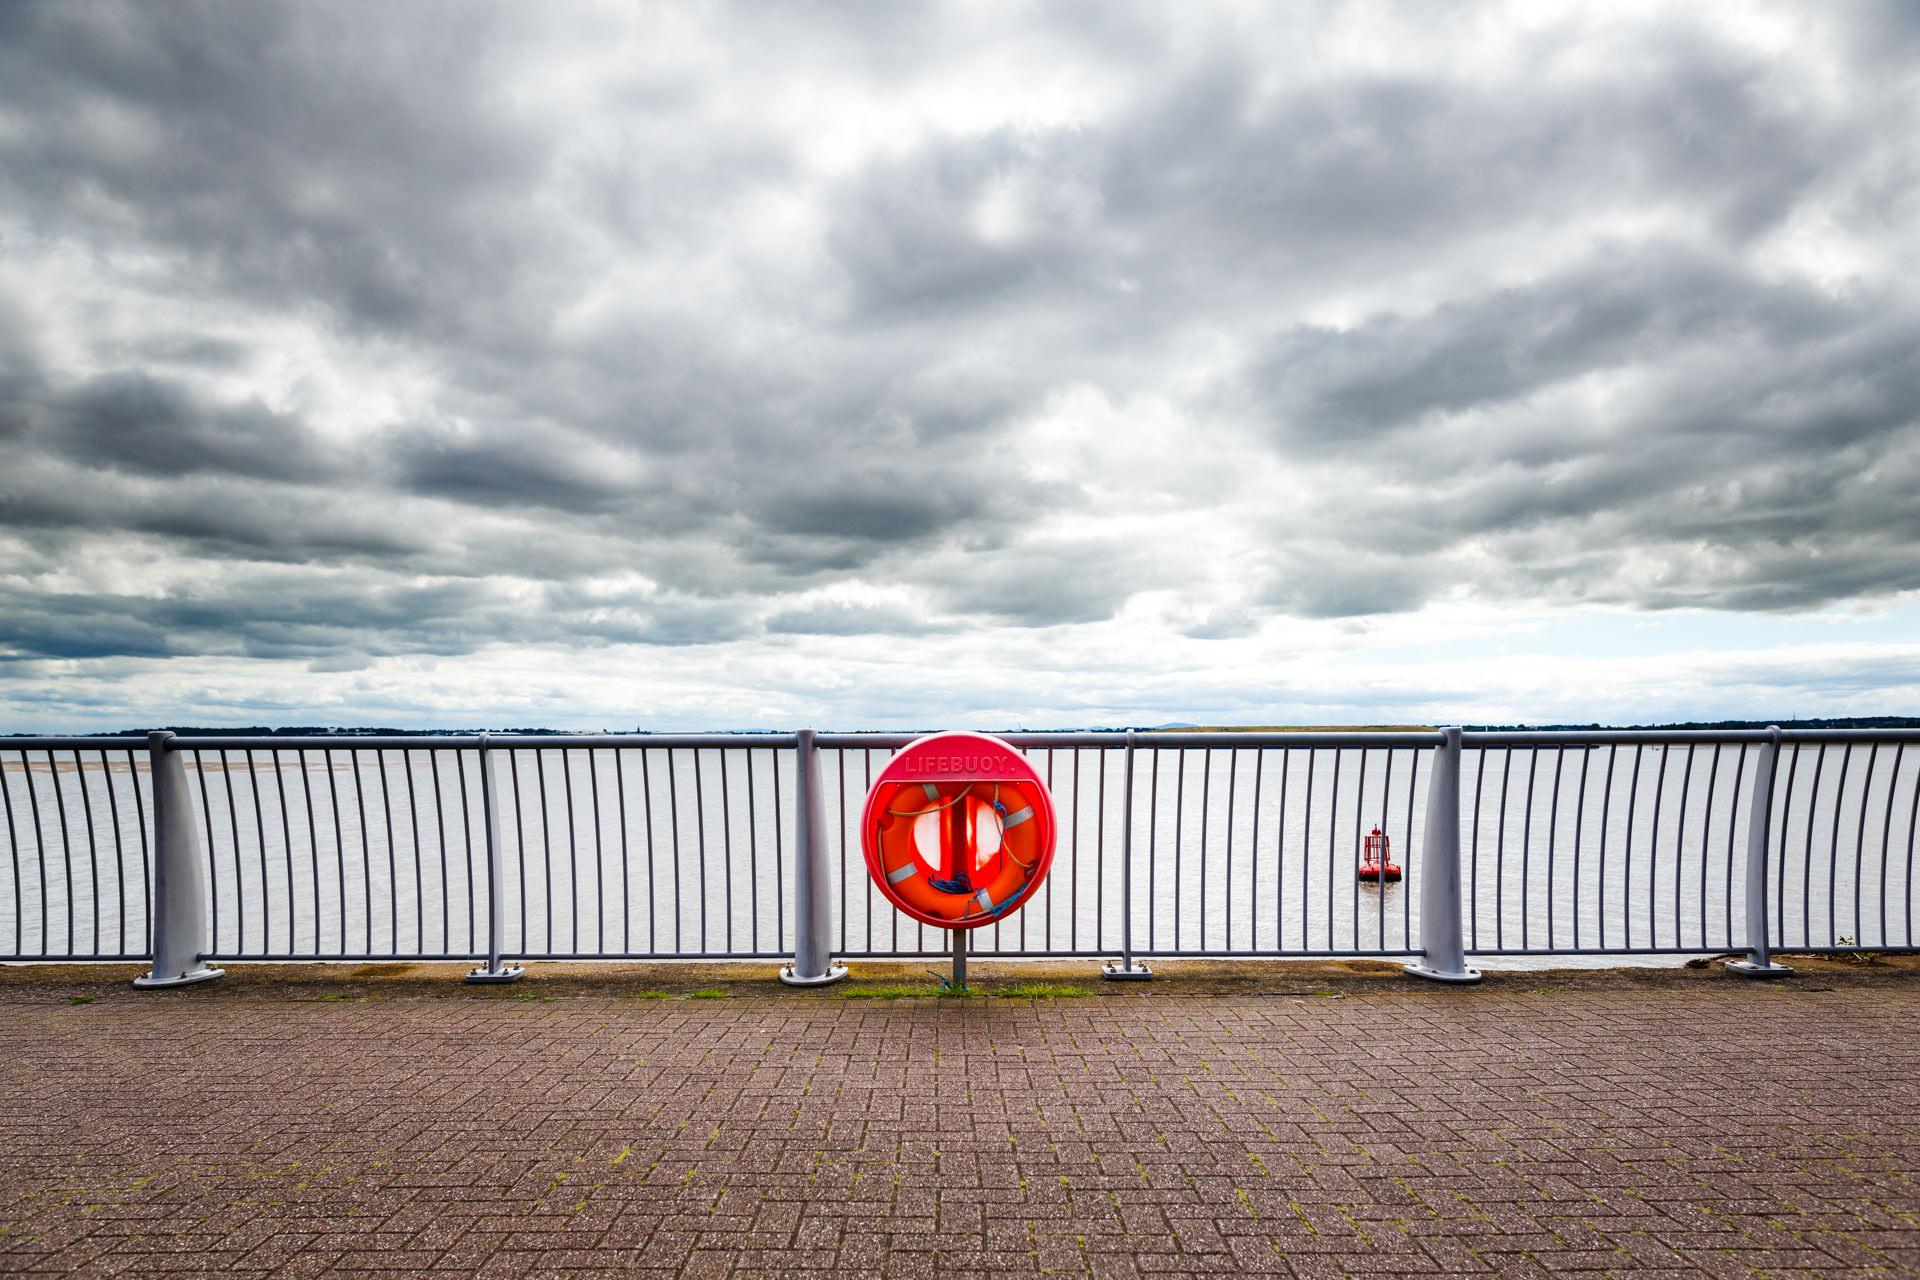 Andrew Wilson Photography Liverpool (26) Otterspool Promenade Mersey Life Ring.jpg